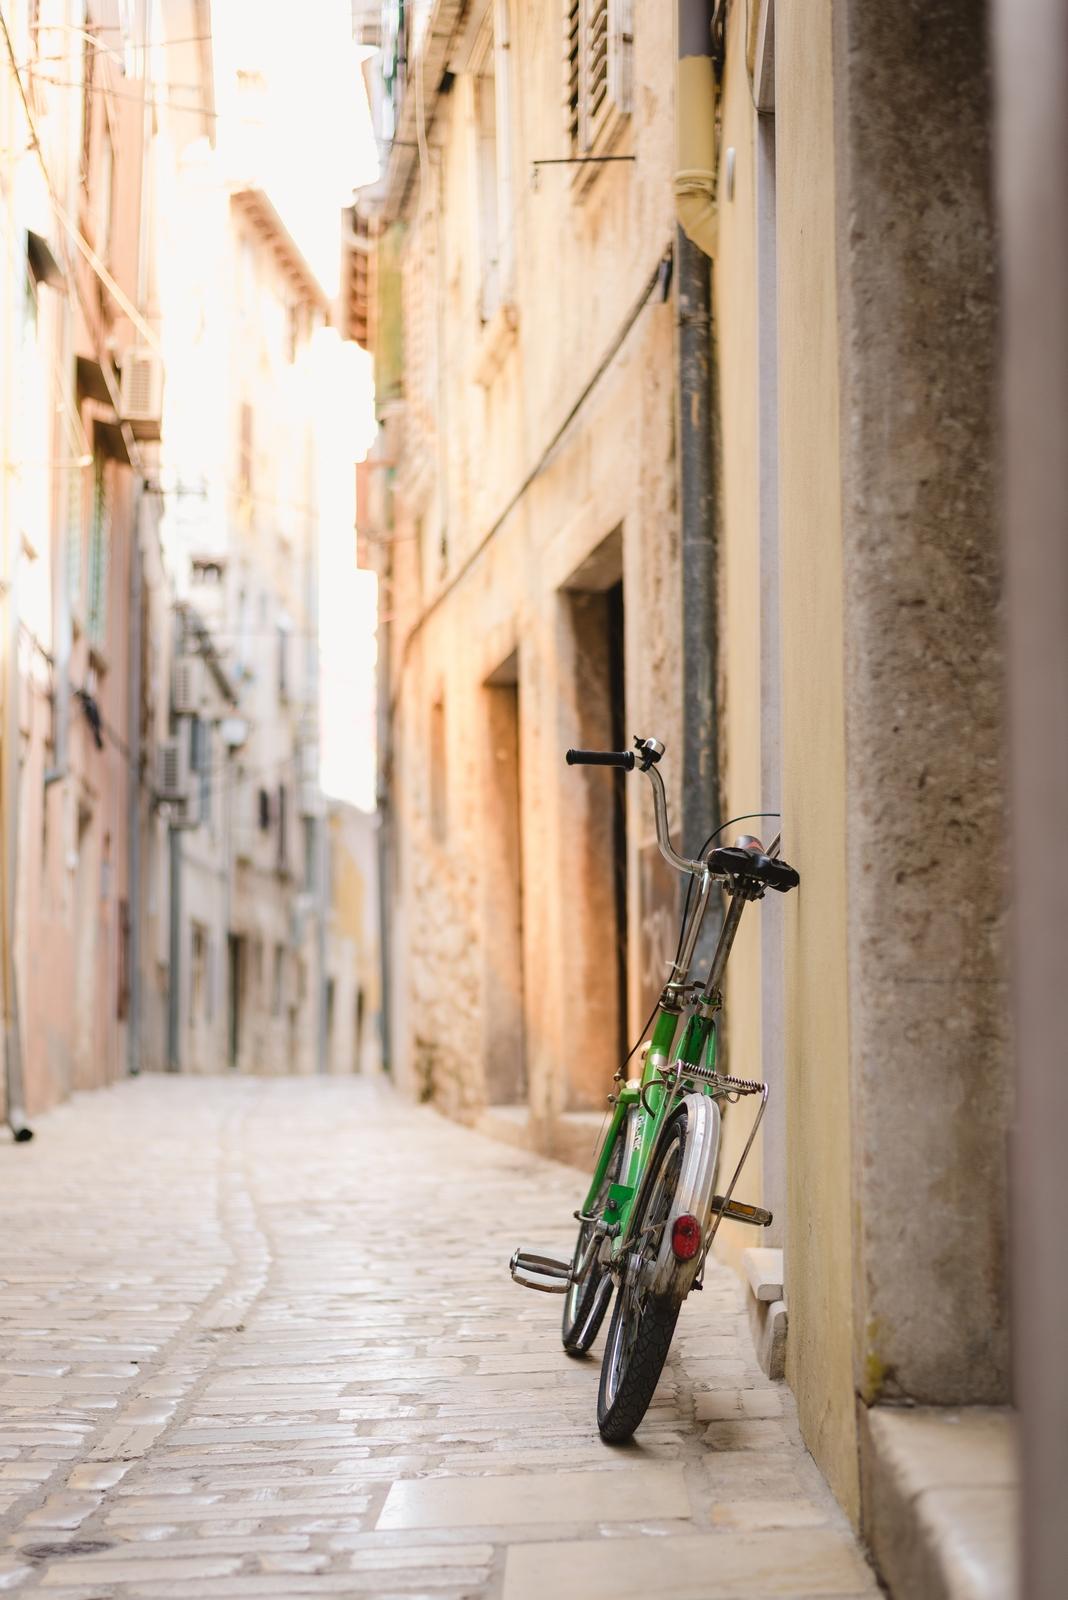 A charming street in the historic city of Rovinj, Croatia - from travel blog http://Epepa.eu